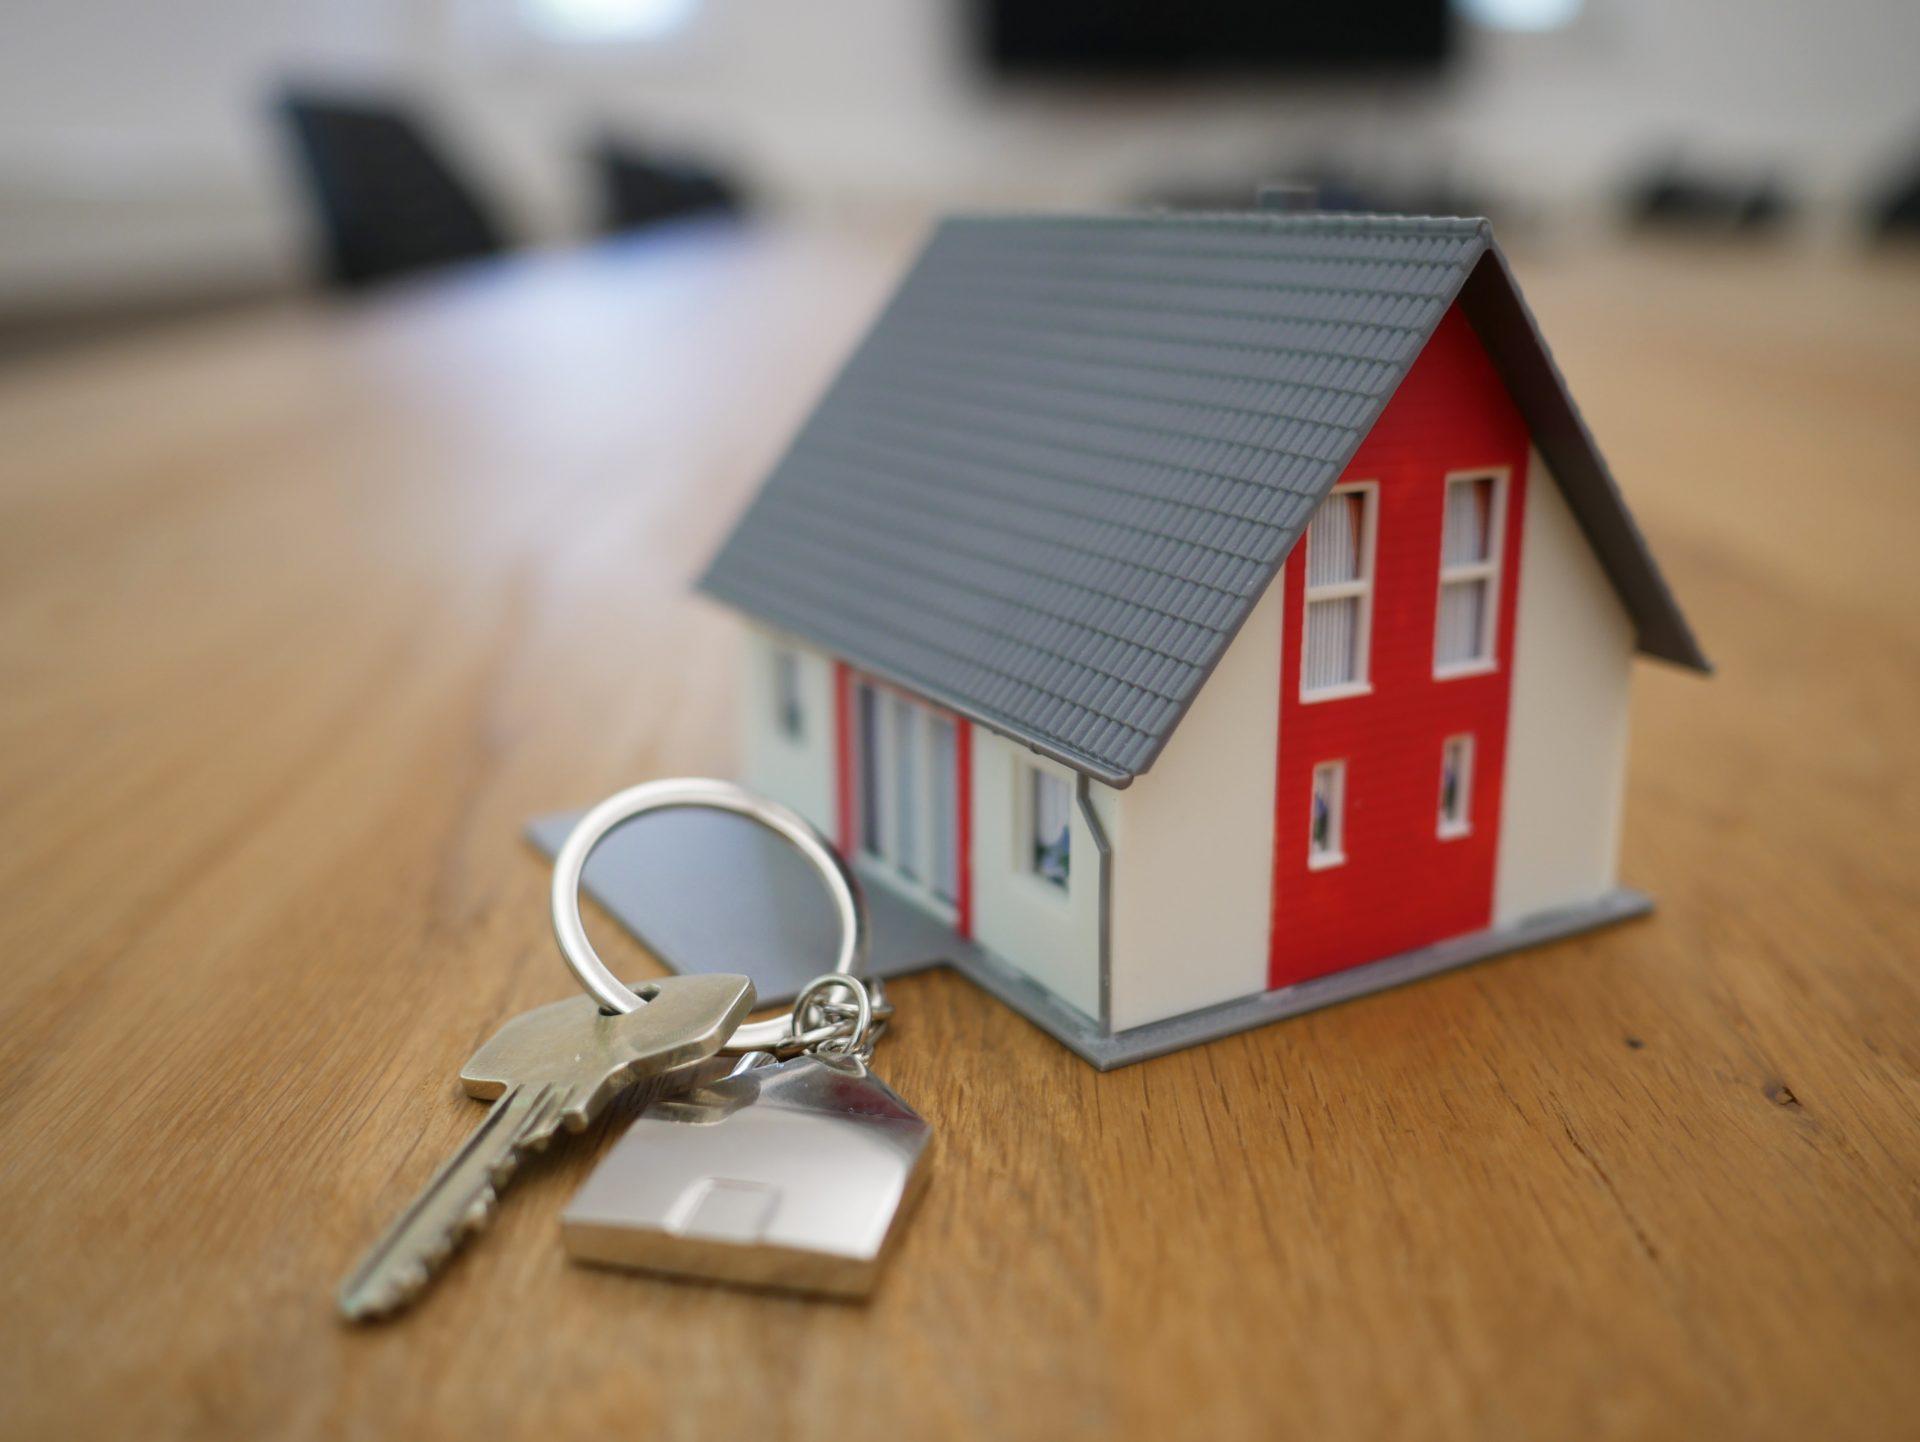 kluce-miniatura-domu-strecha-privesok-nove-byvanie-dreveny-stol